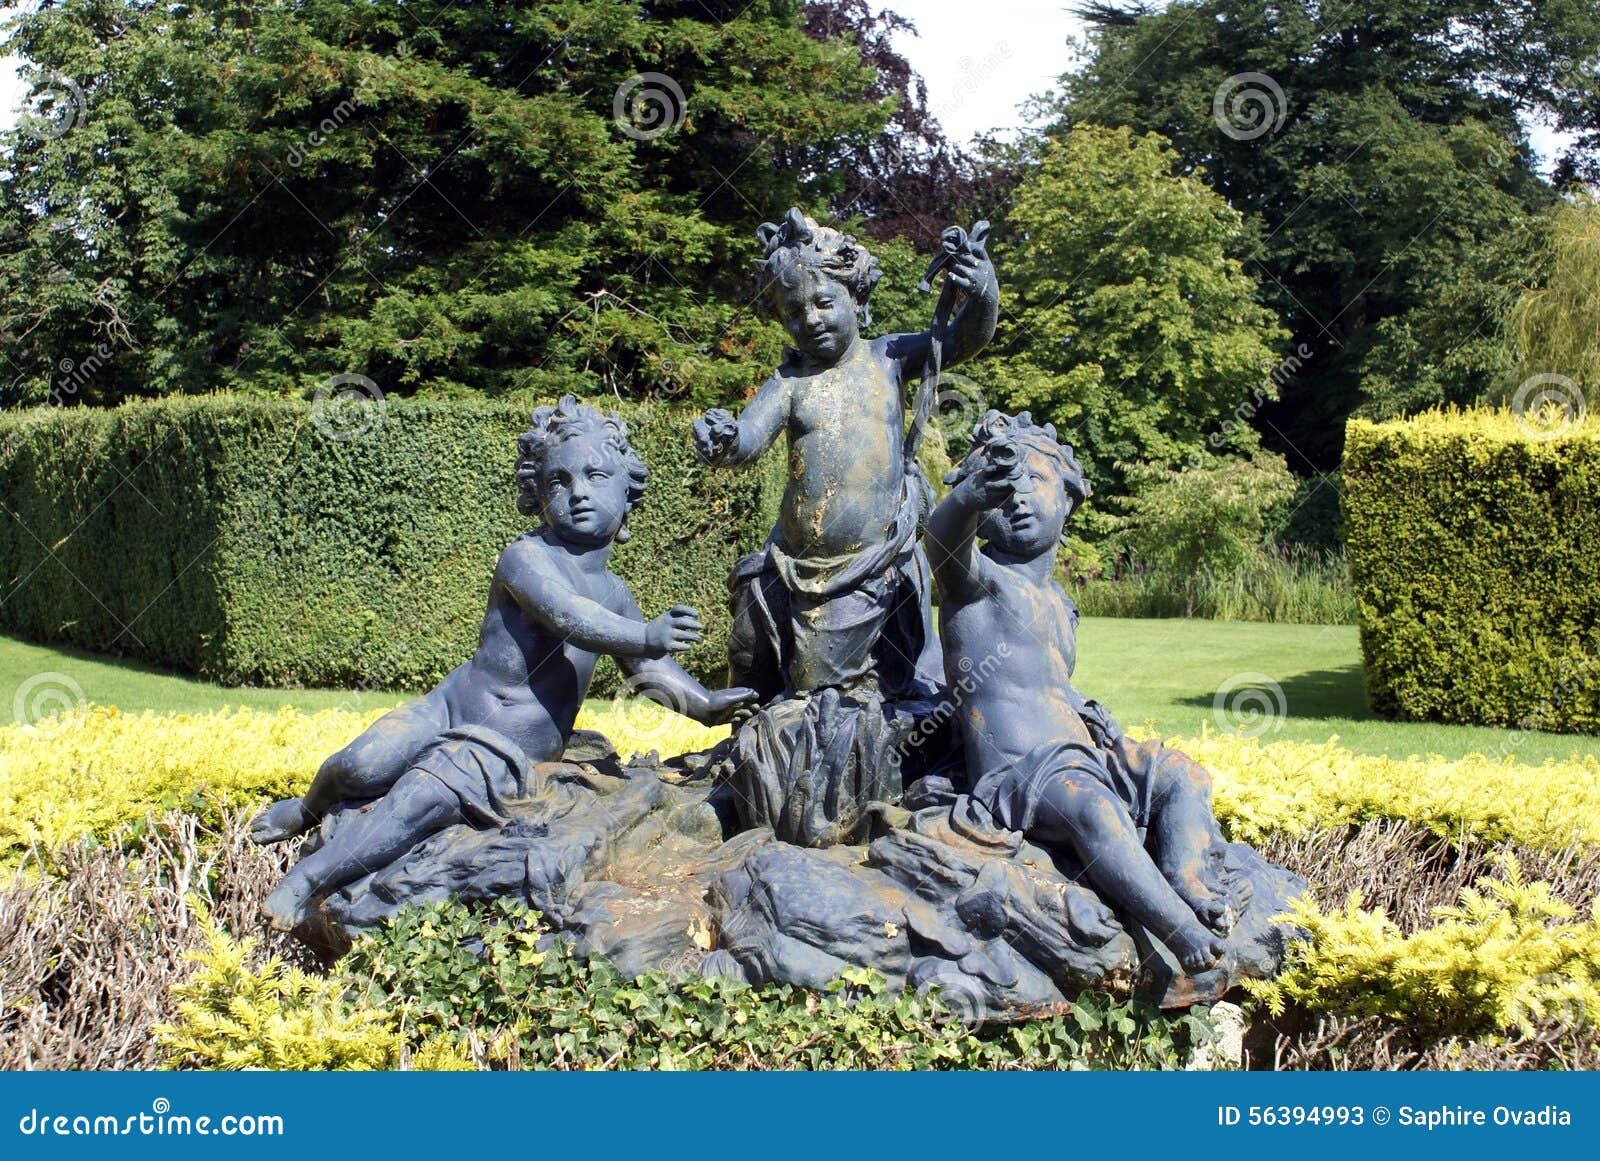 statuen in einem formalen garten eibe topiary in england europa stockfoto bild 56394993. Black Bedroom Furniture Sets. Home Design Ideas